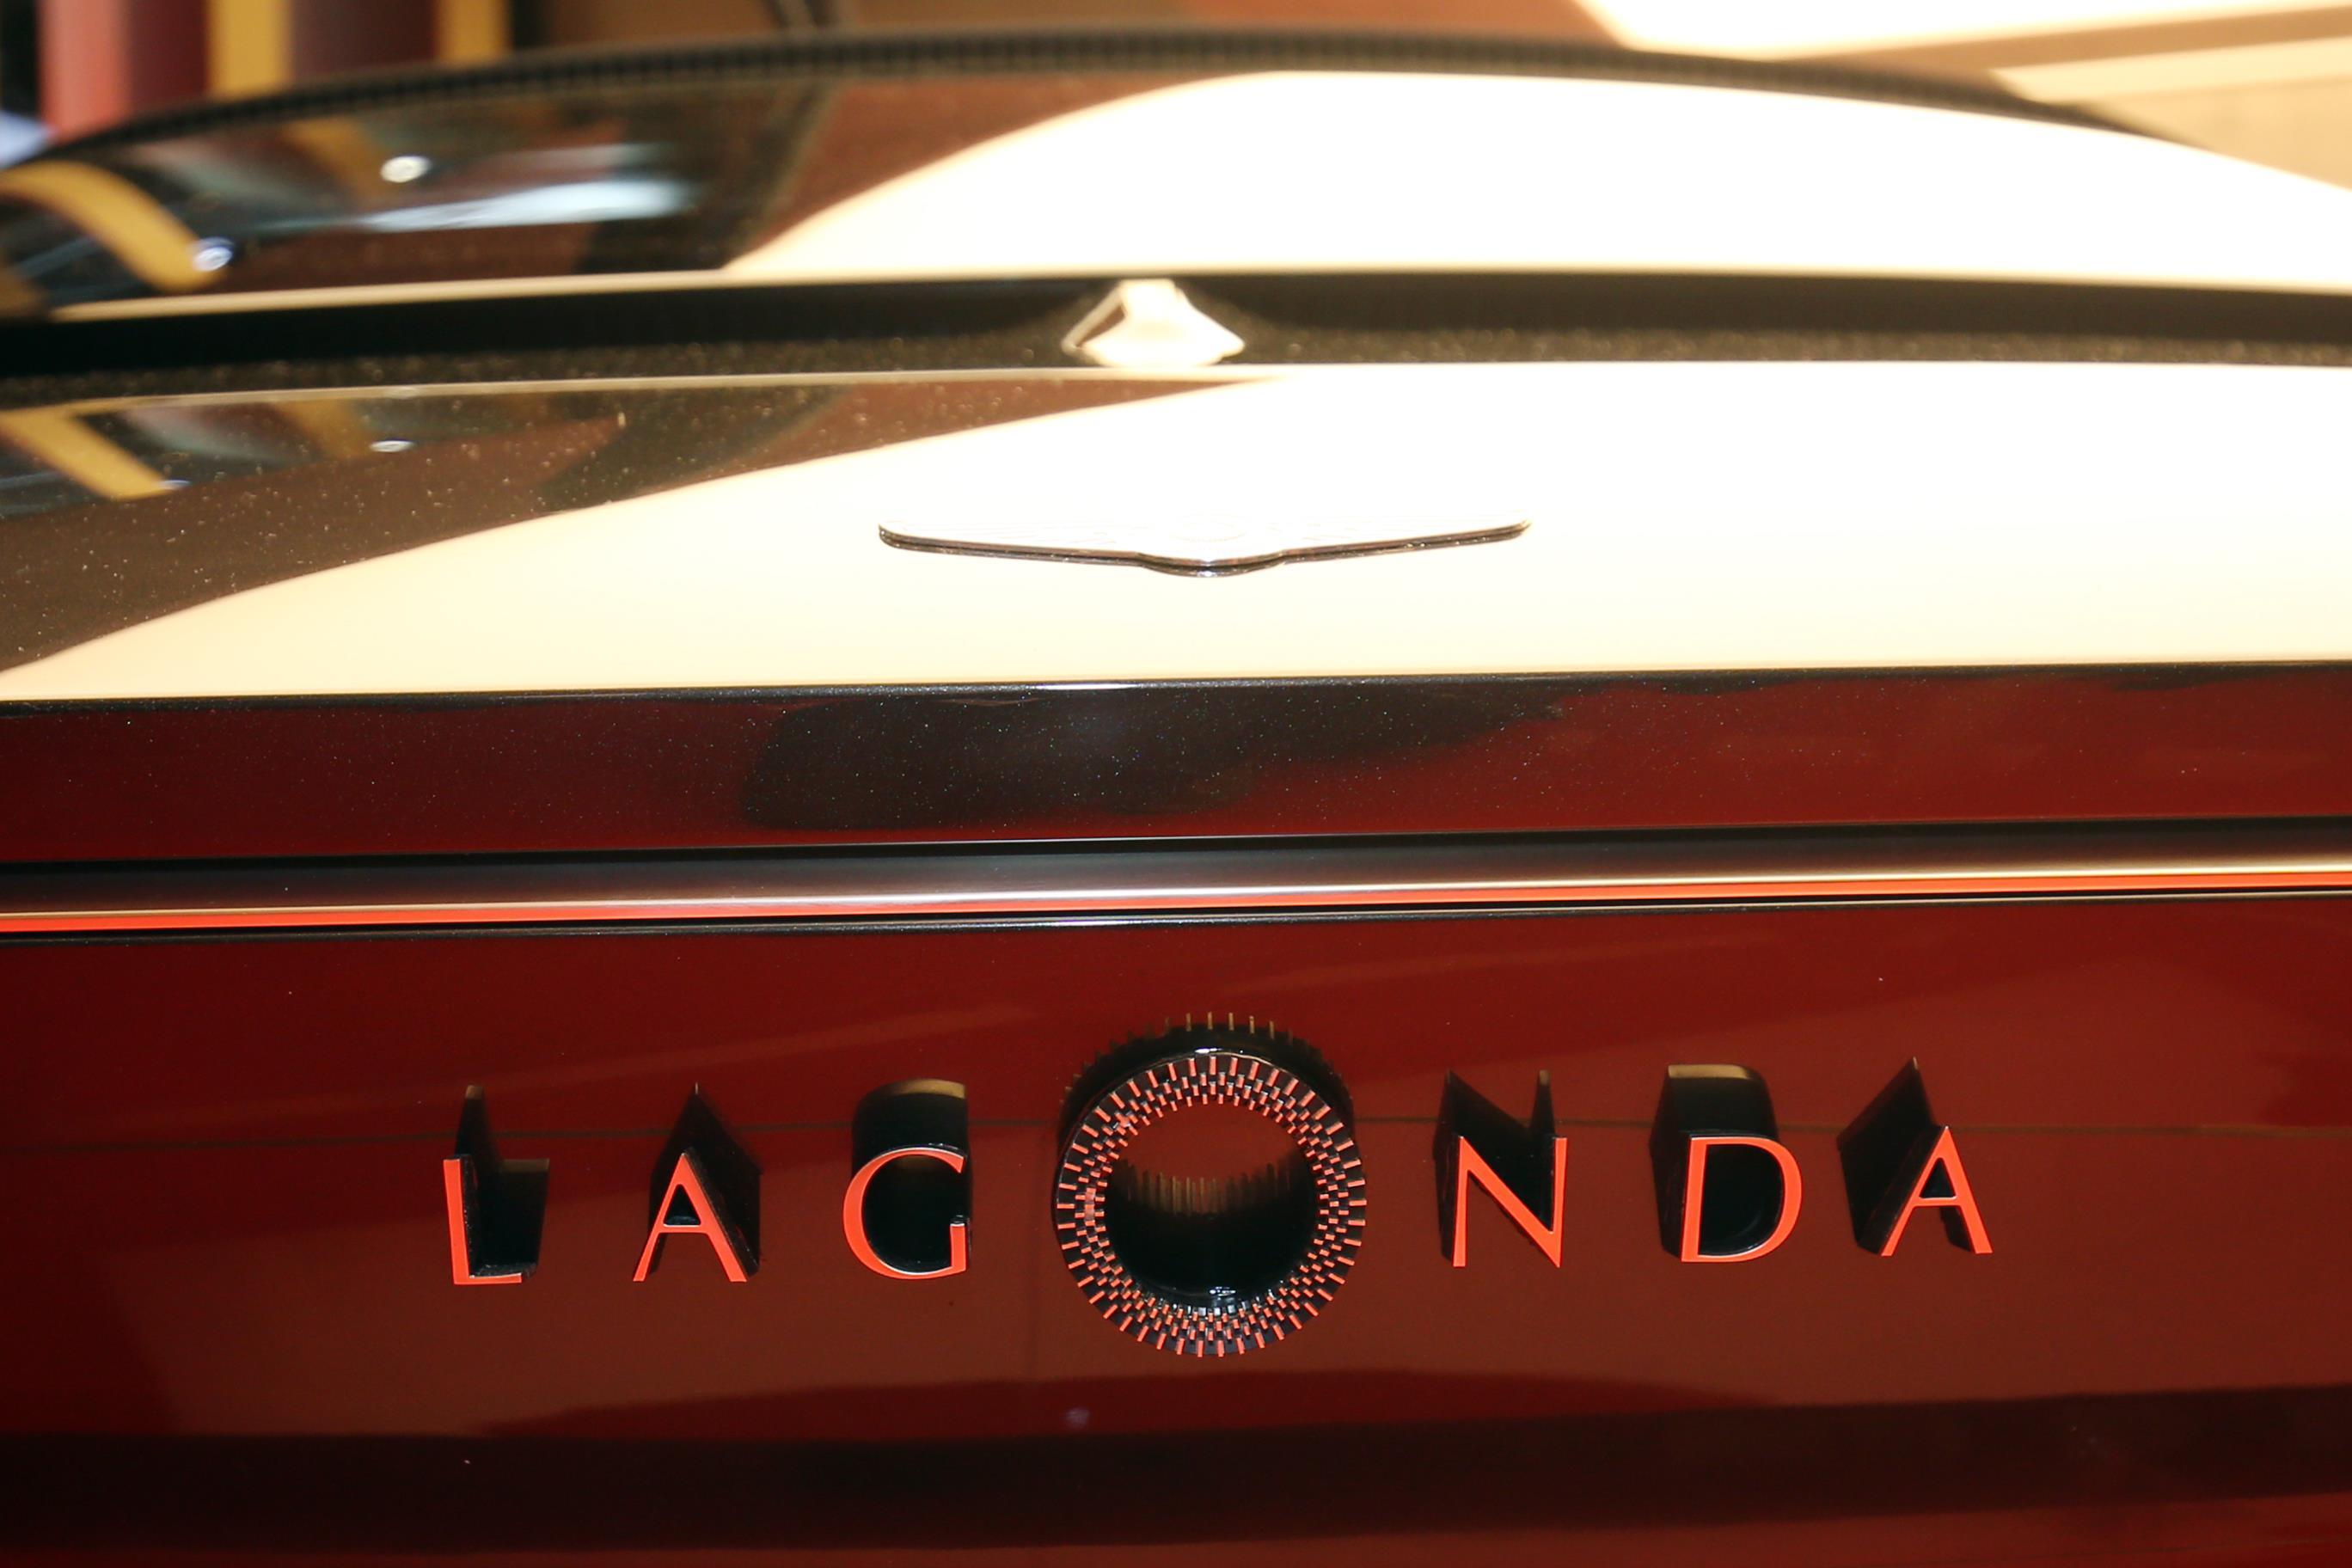 Geneva Motor Show 2018 Mega Gallery Part 1 (187)